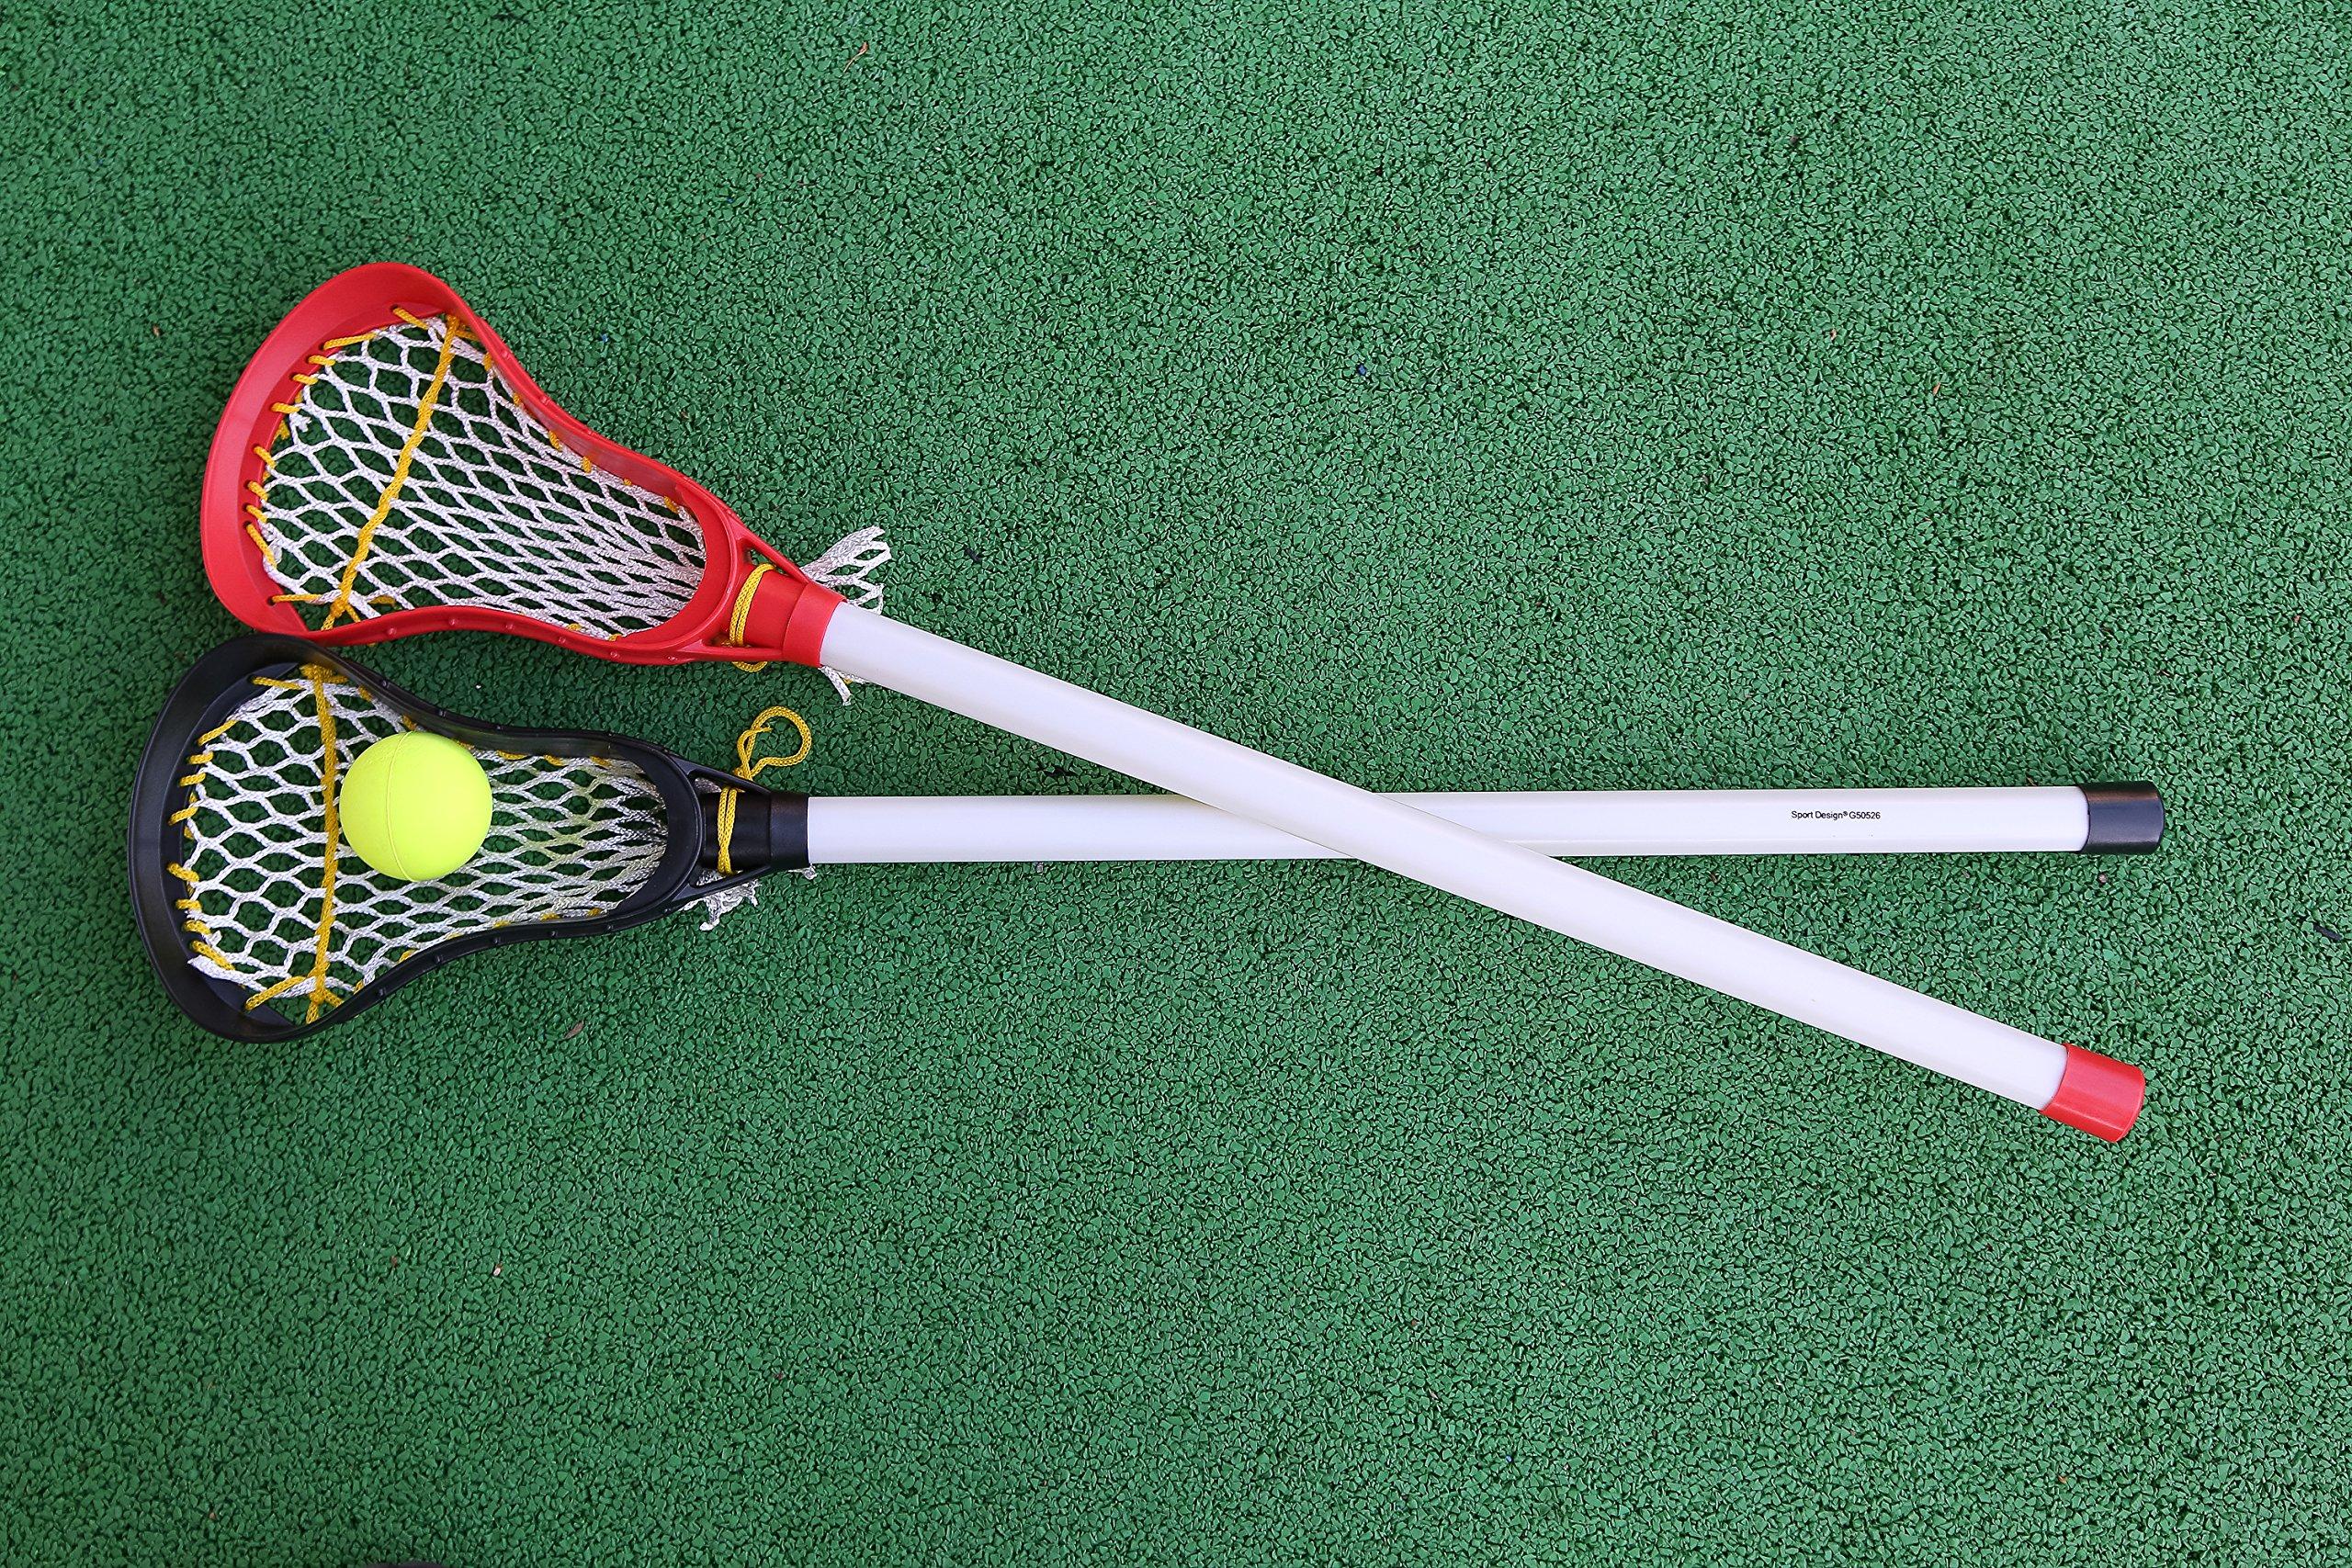 Kids Lacrosse Sticks - 2 Sticks (30 Inches) & 1 Ball - Soft Mesh Pockets, Durable Plastic Handles, & Large Head Design by Junior Lacrosse (Image #6)